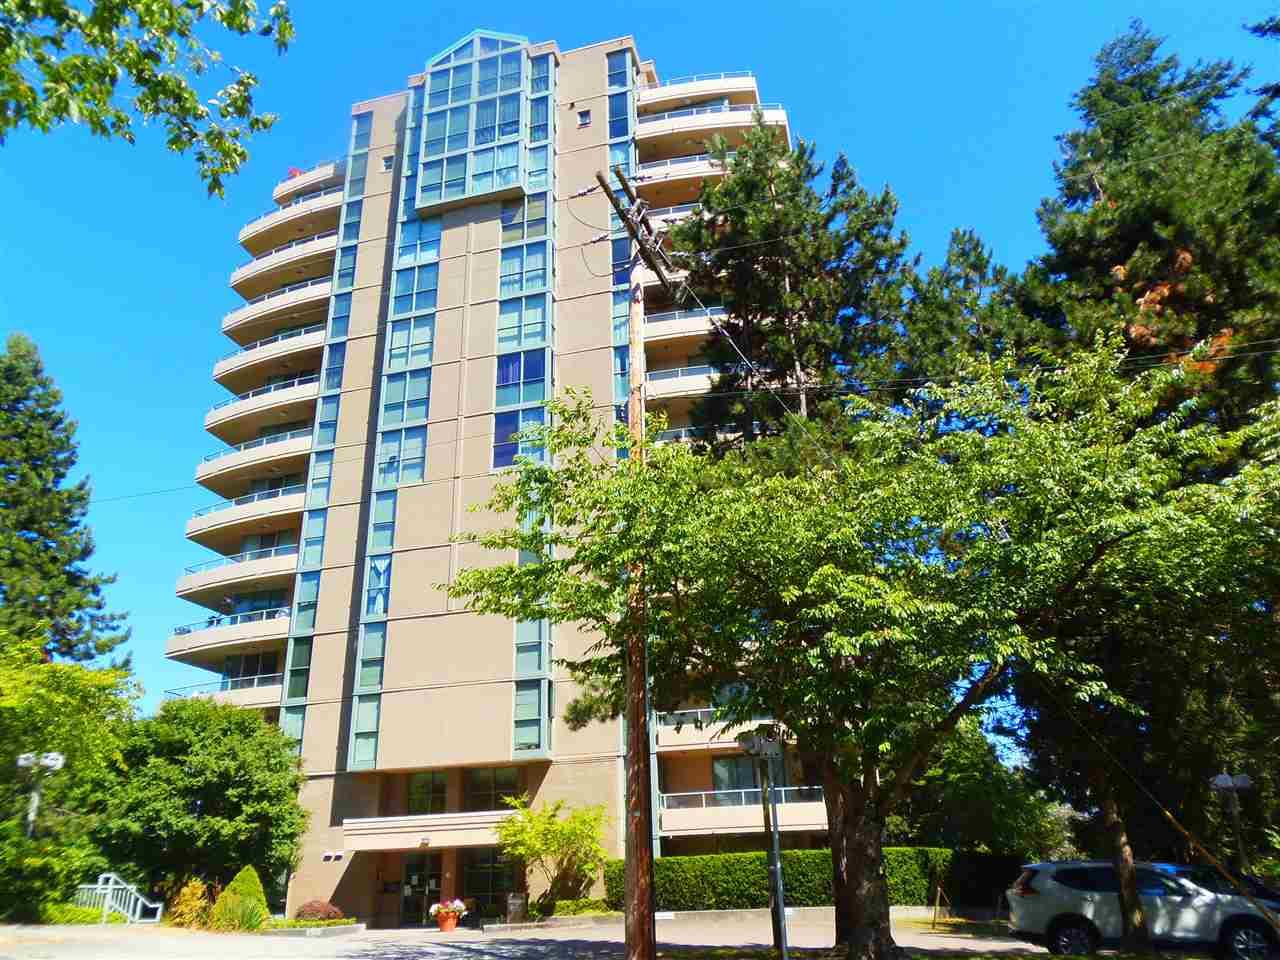 Condo Apartment at 440 7288 ACORN AVENUE, Unit 440, Burnaby South, British Columbia. Image 1